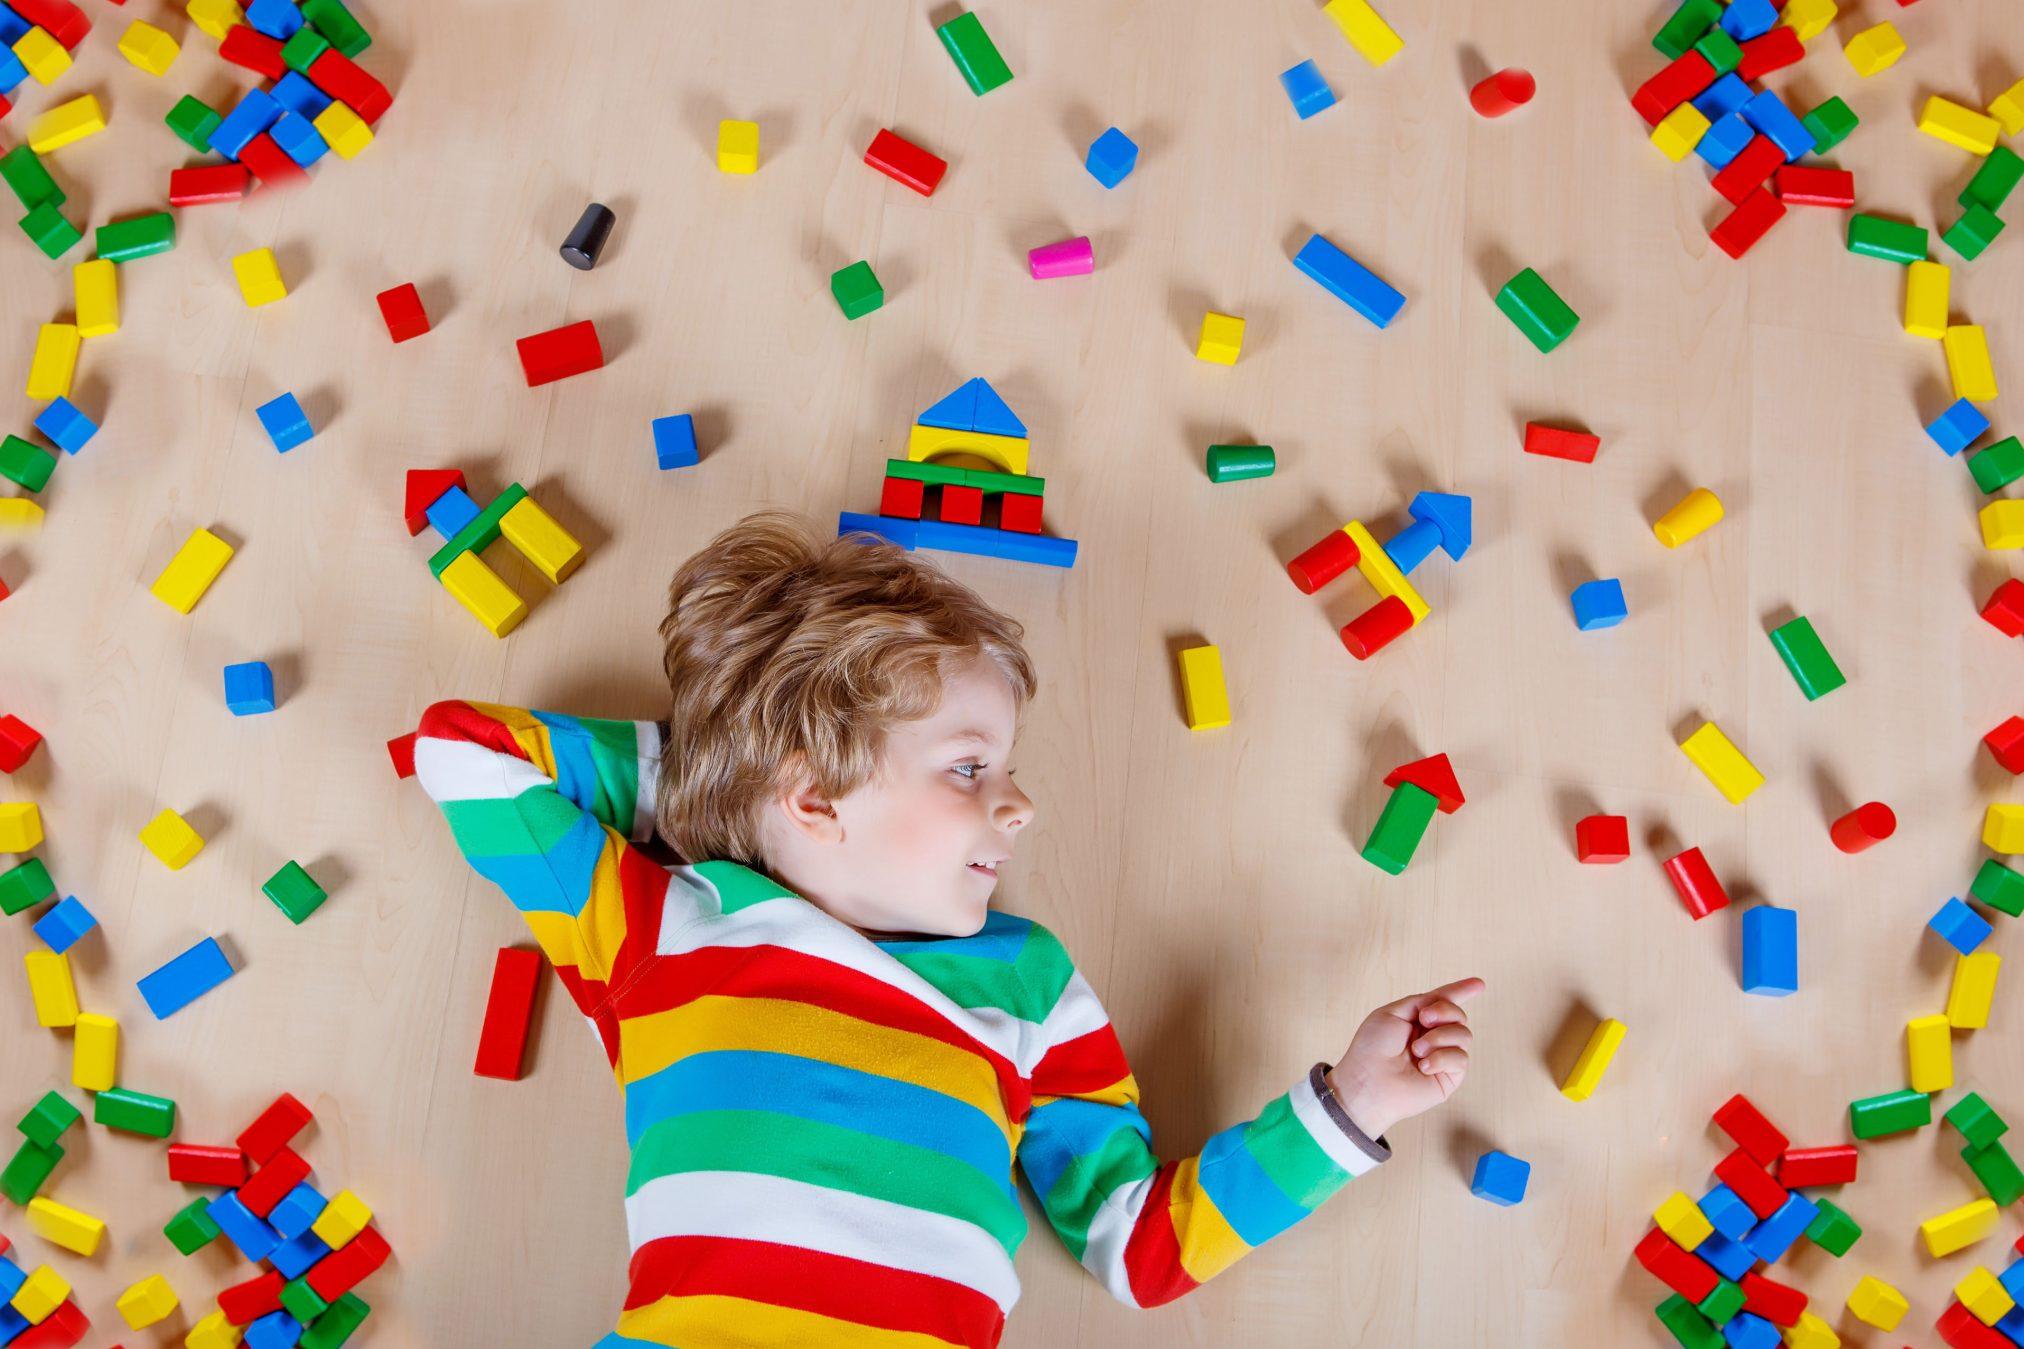 the reason behind skyrocketing autism rates ajp